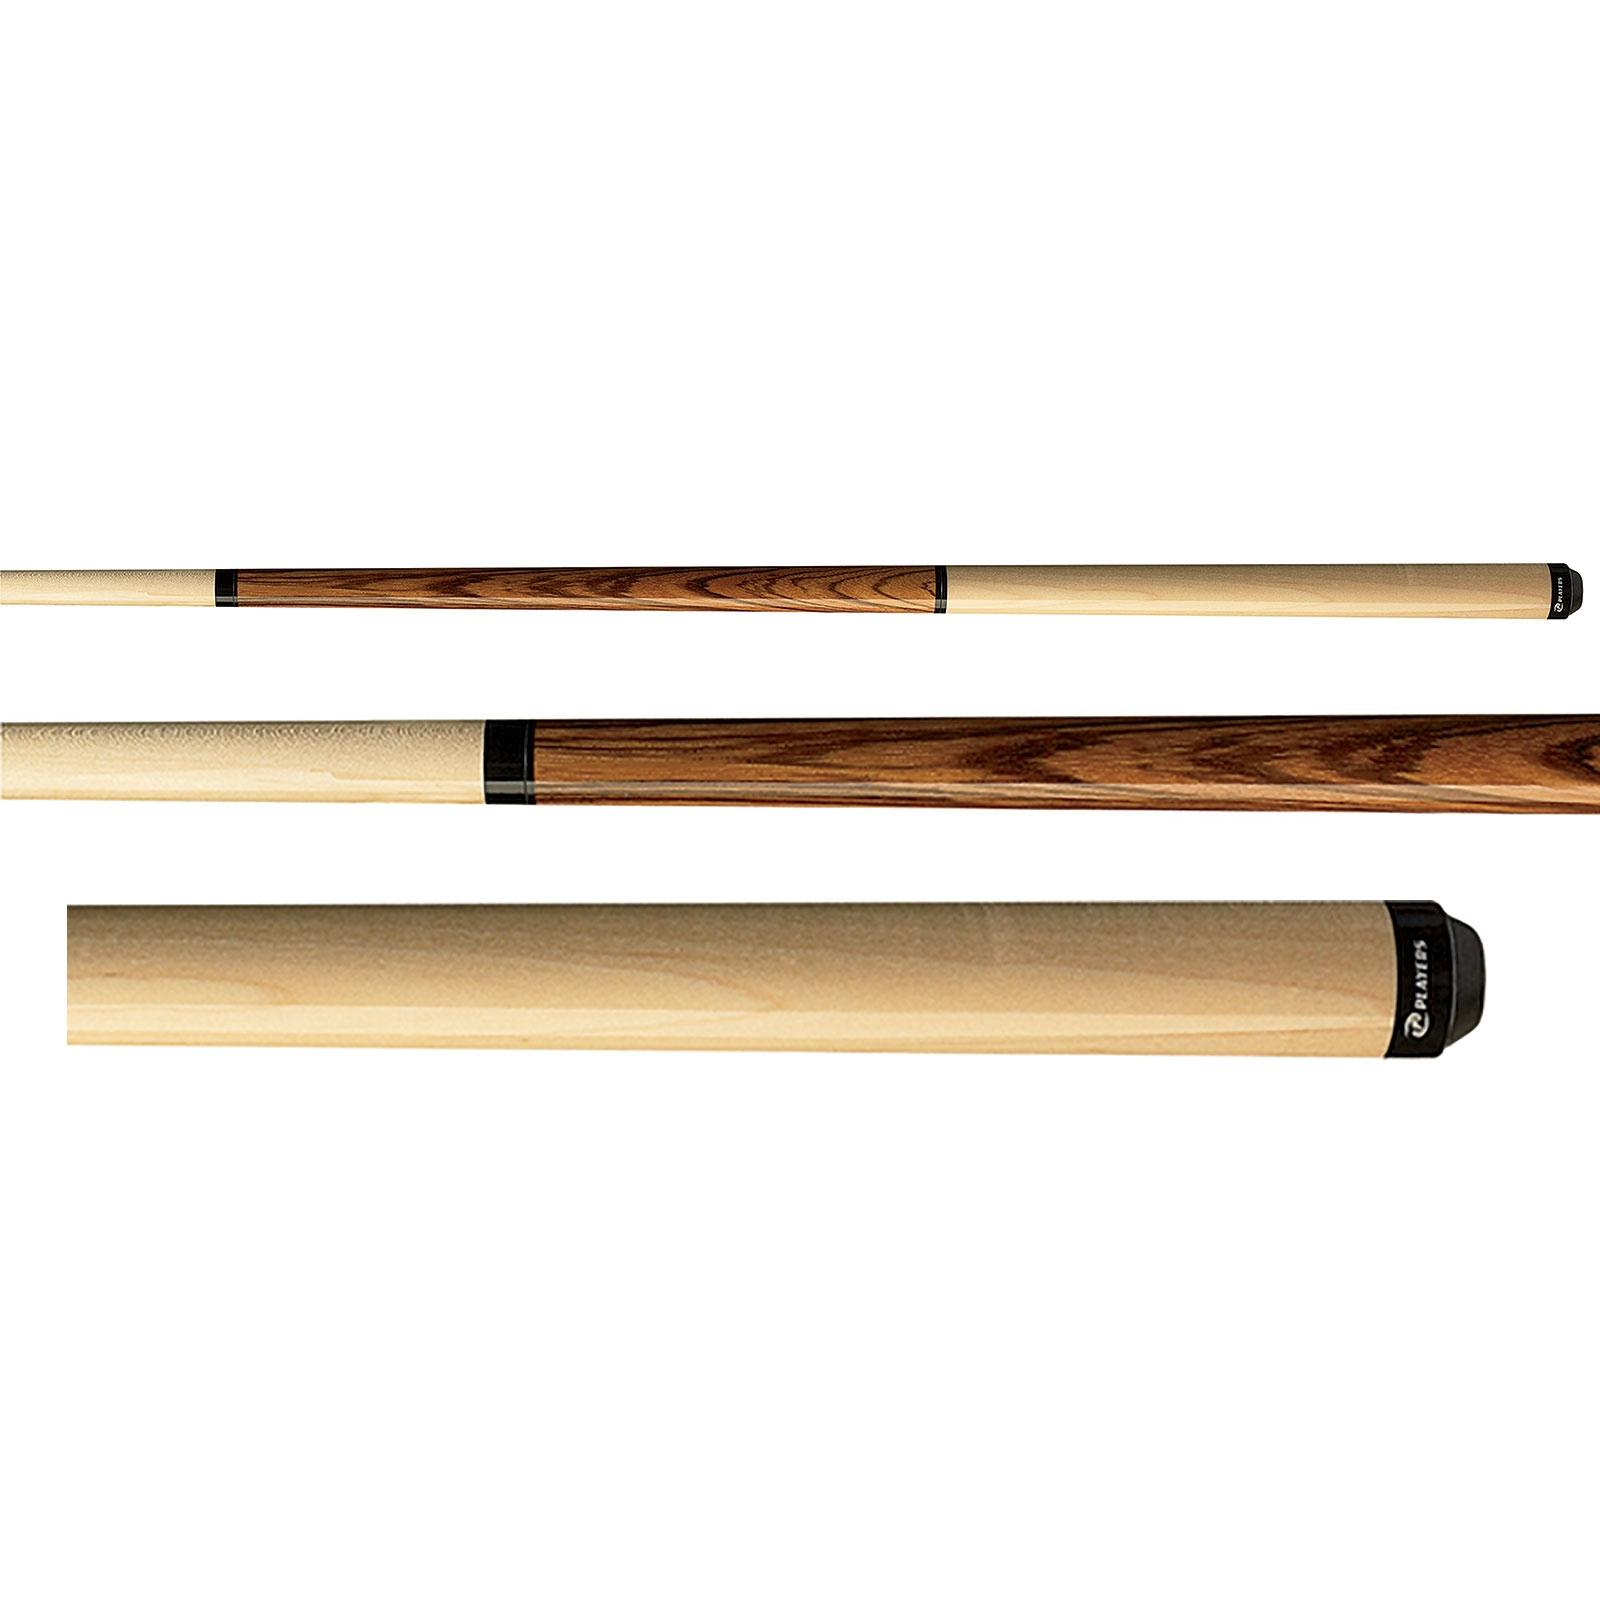 Players Jb9 Maple And Zebrawood Jump Break Pool Cue Stick